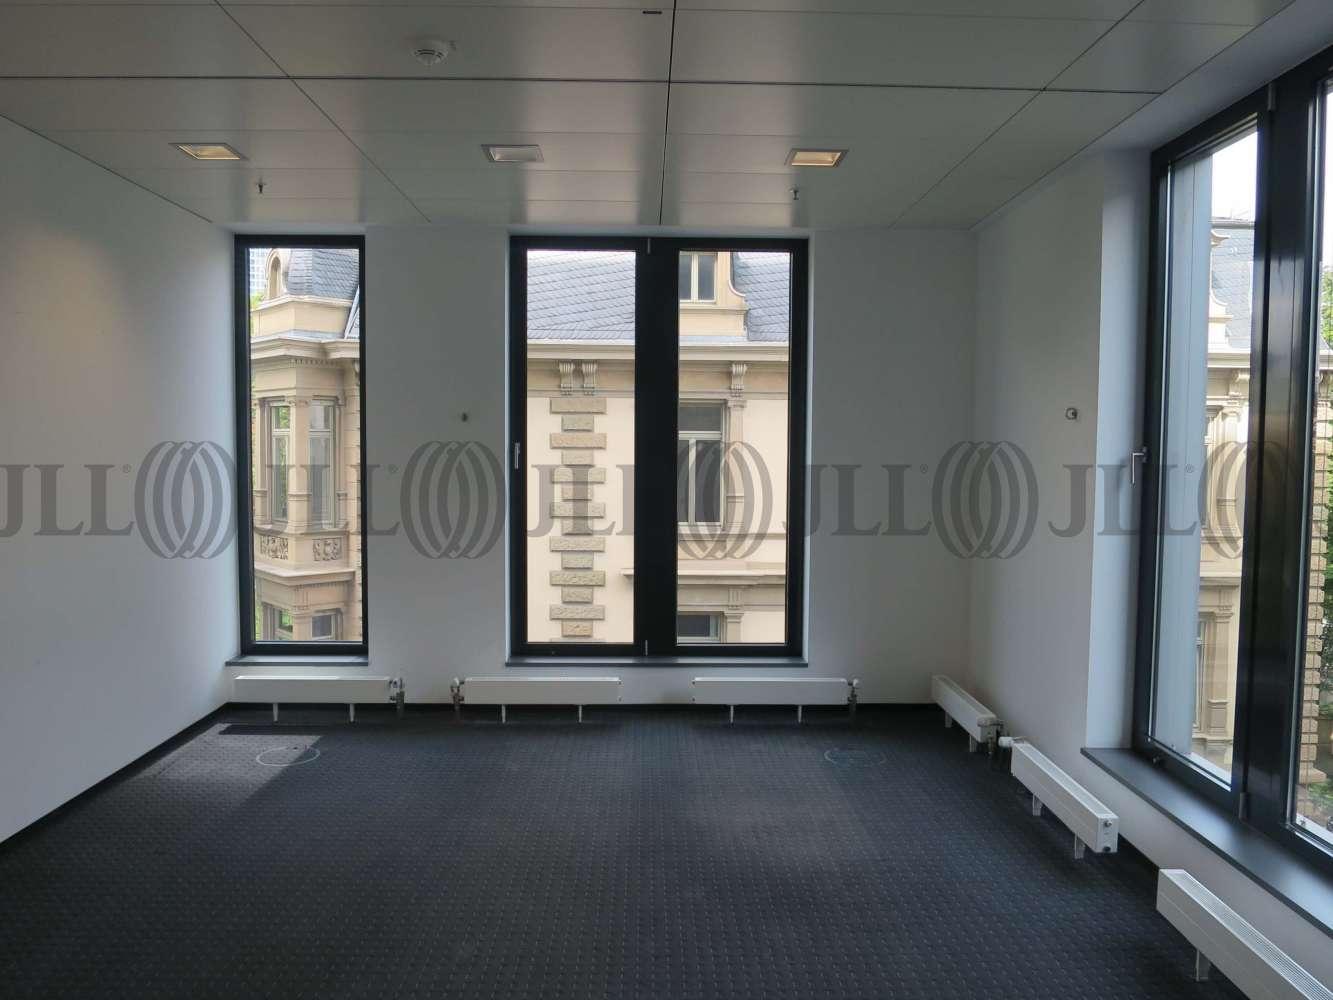 Büros Frankfurt am main, 60323 - Büro - Frankfurt am Main, Westend-Süd - F0083 - 10581743